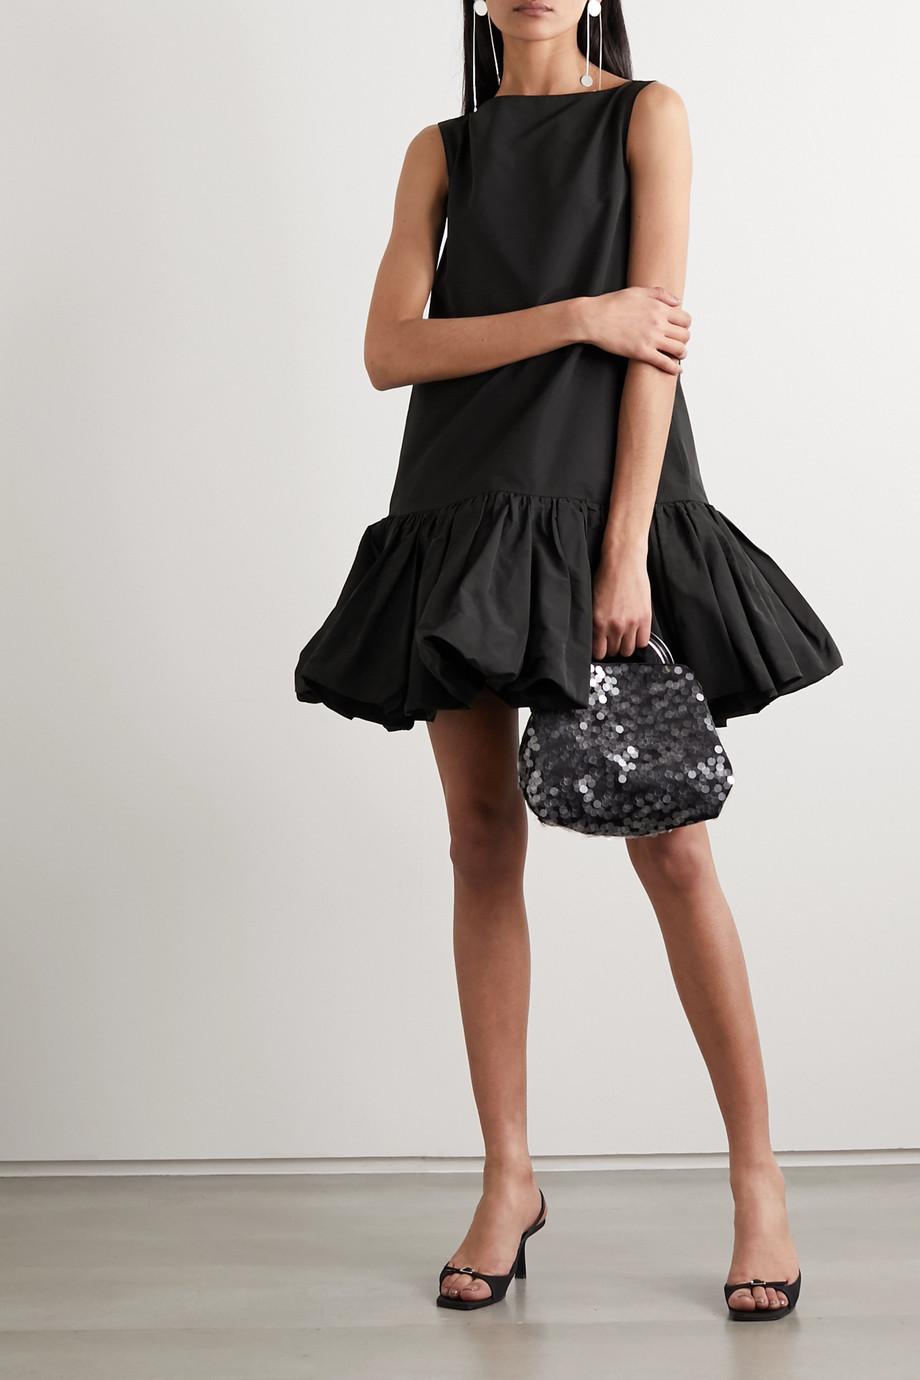 Valentino Cotton-blend faille mini dress